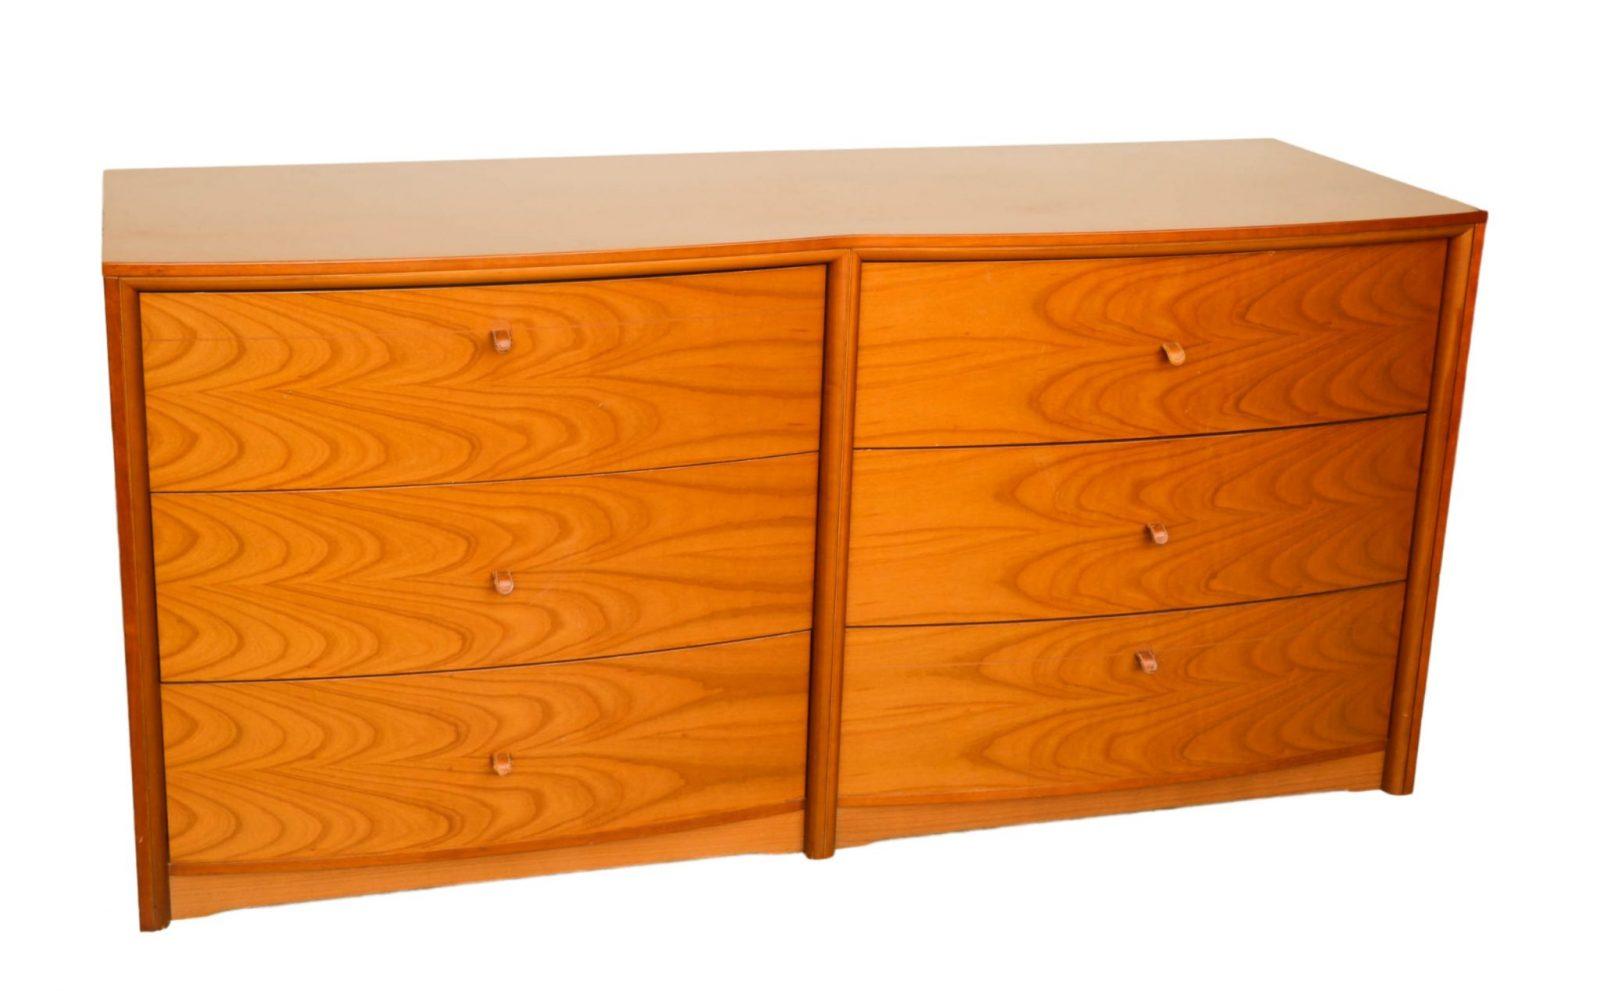 beautiful modern mid century italian dresser chest of drawers. Black Bedroom Furniture Sets. Home Design Ideas